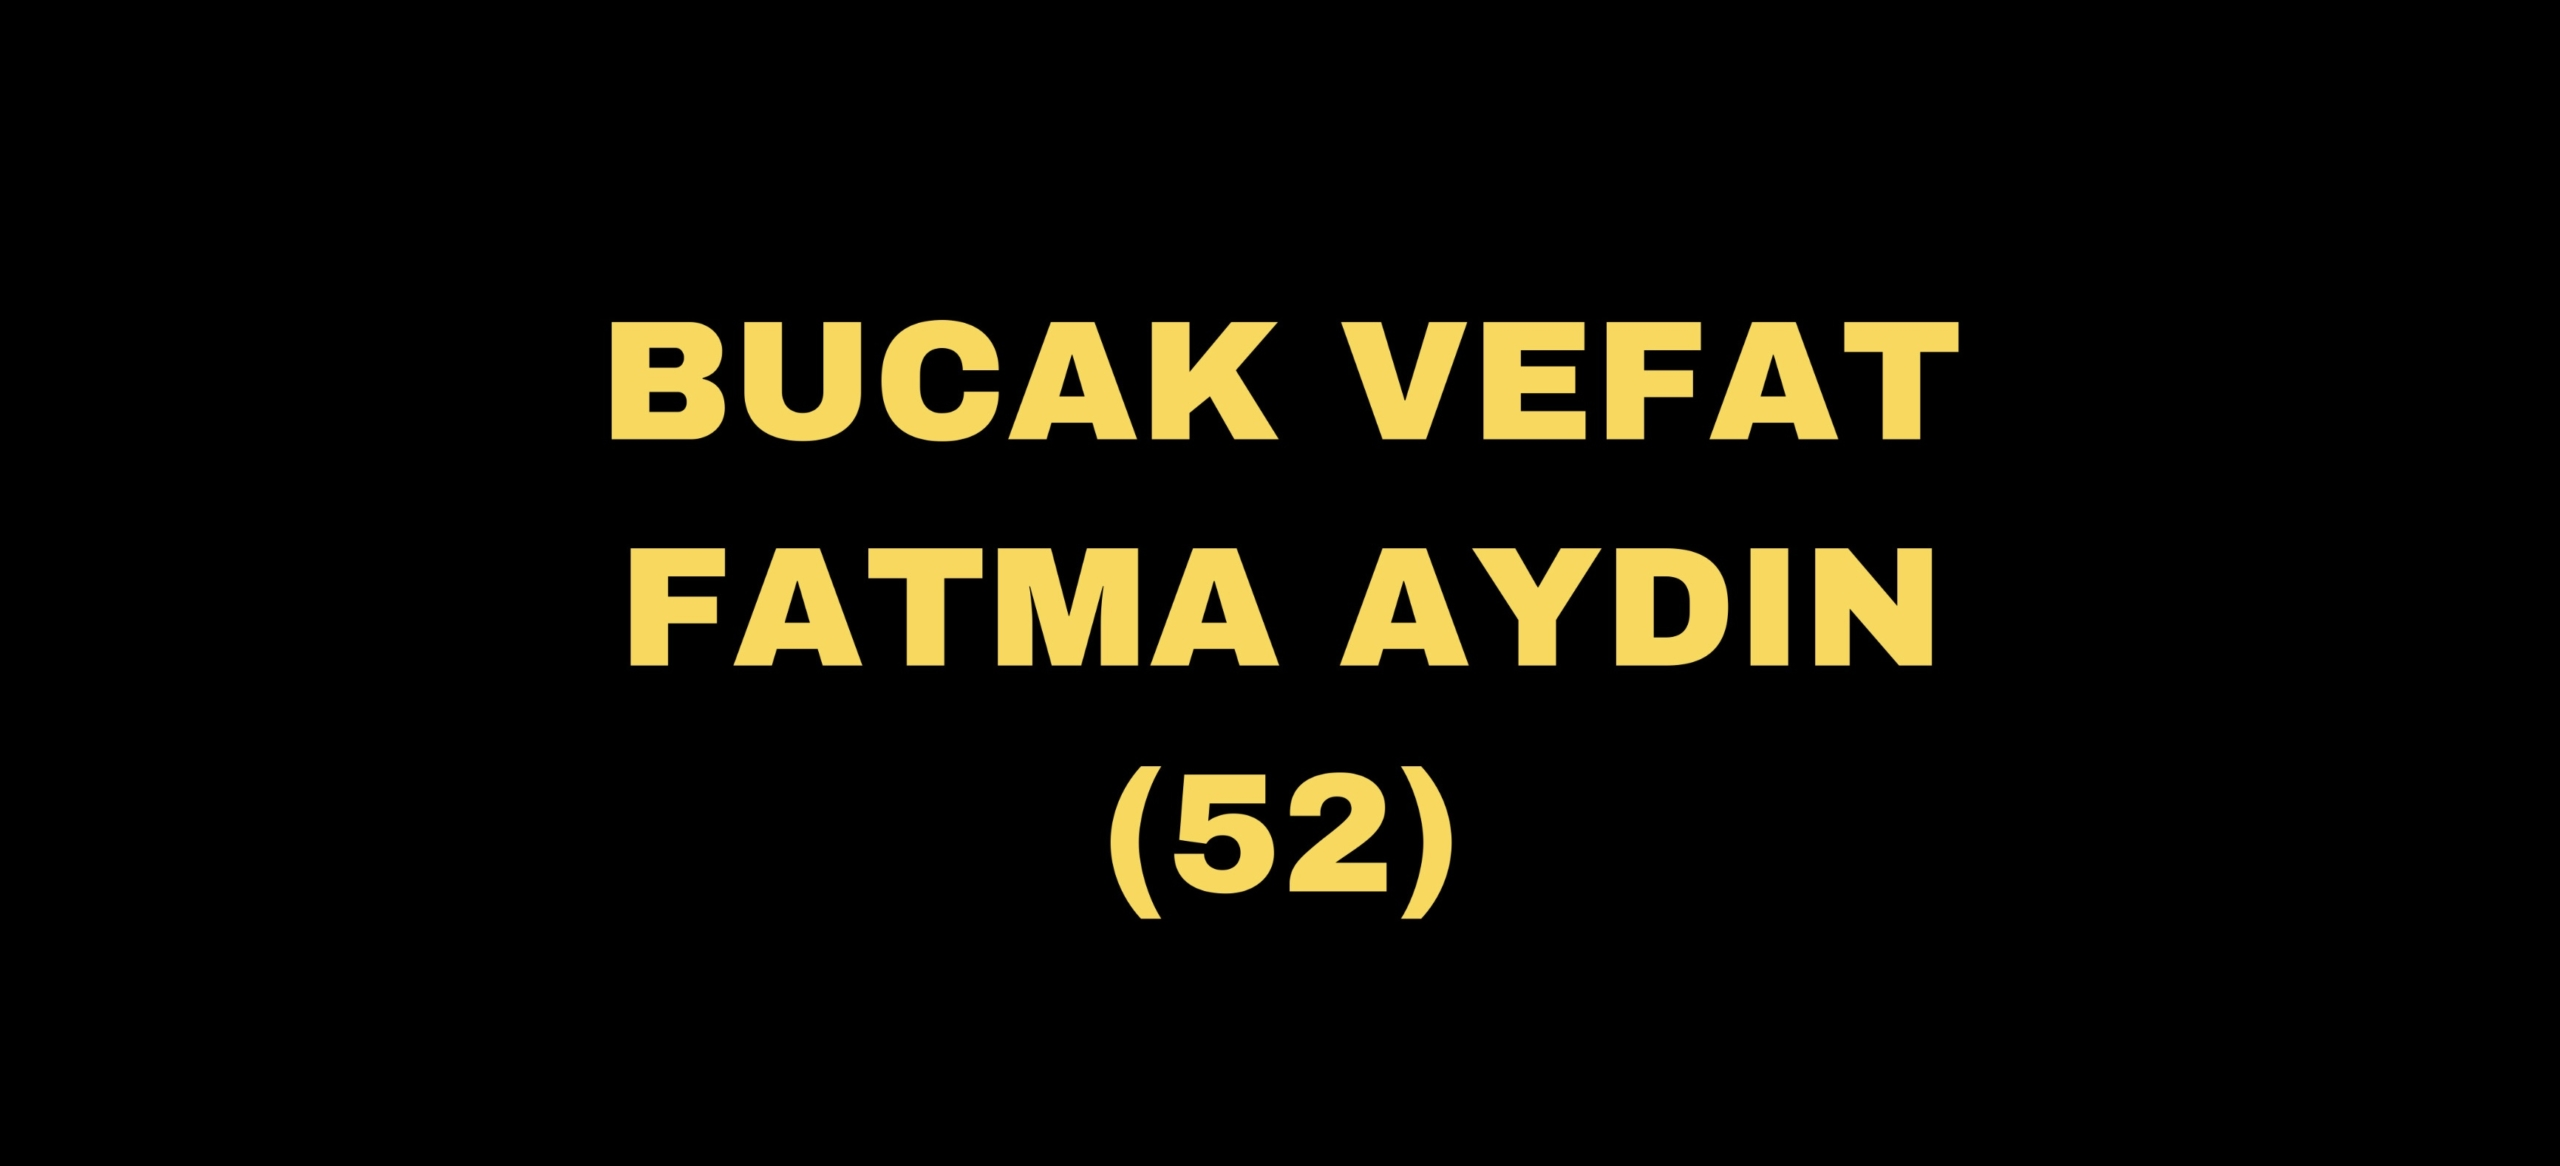 BUCAK VEFAT FATMA AYDIN (52)